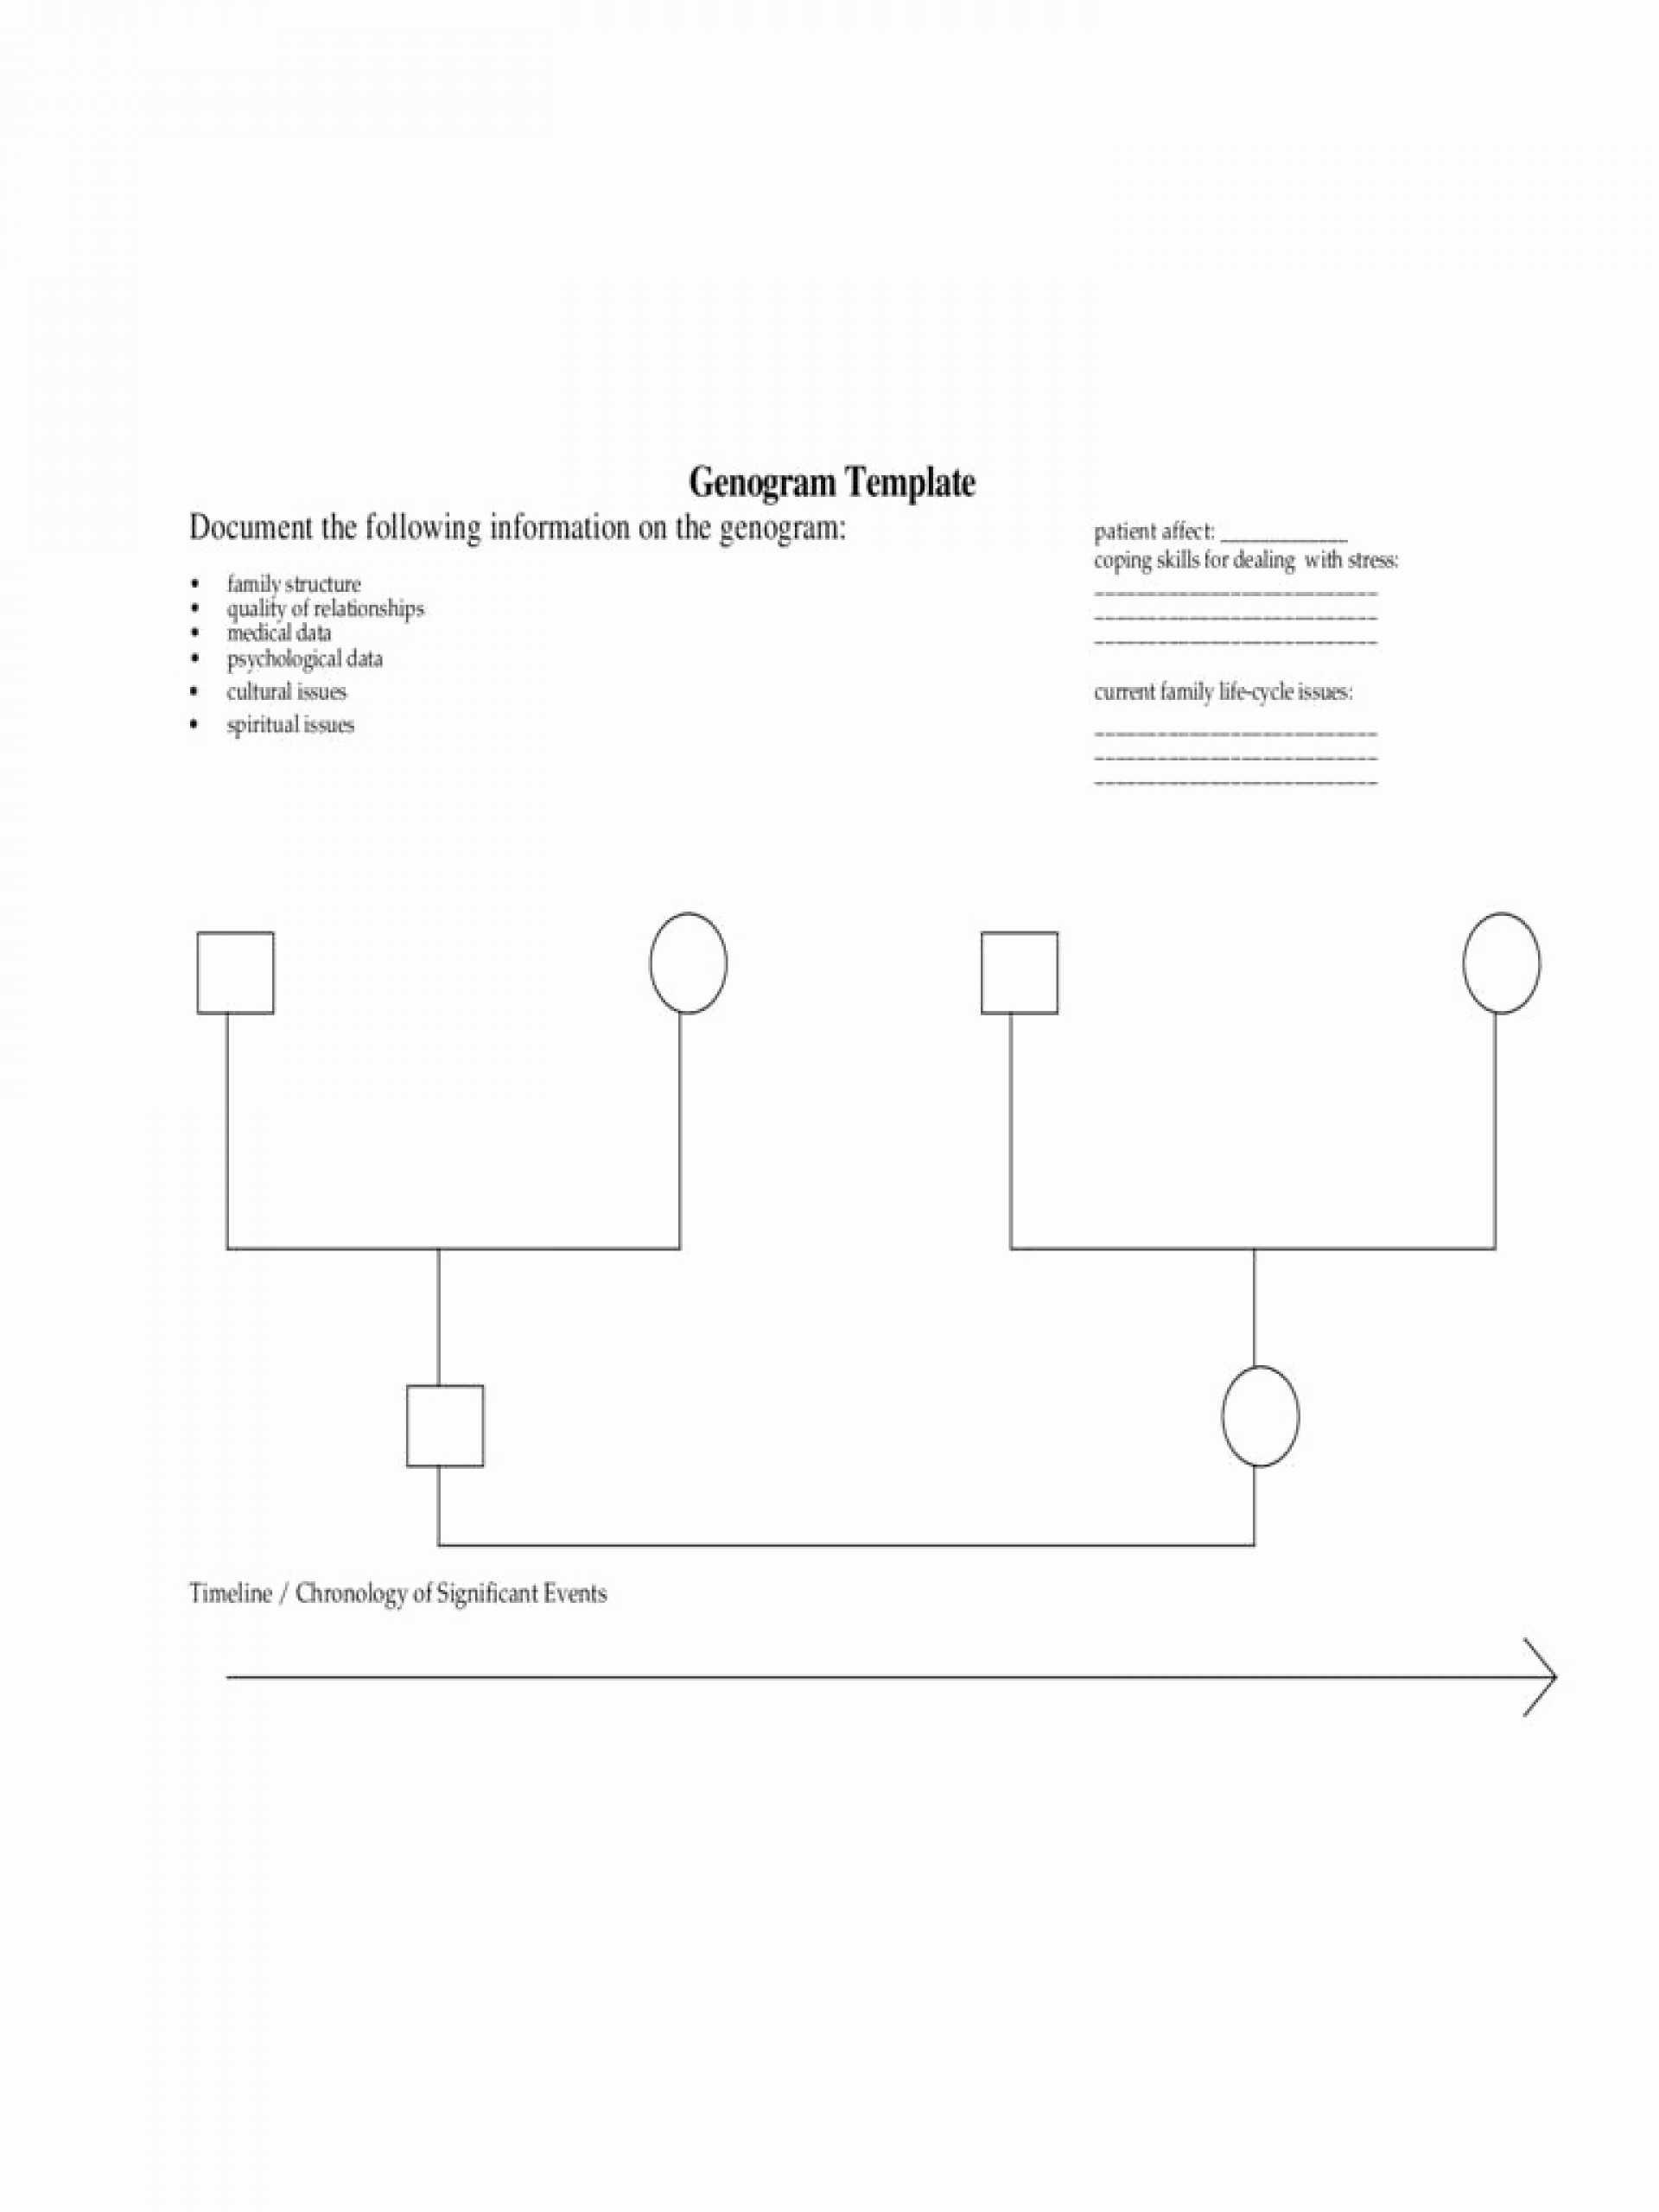 032 Template Ideas Genogram For Mac Download Blank Family Intended For Family Genogram Template Word